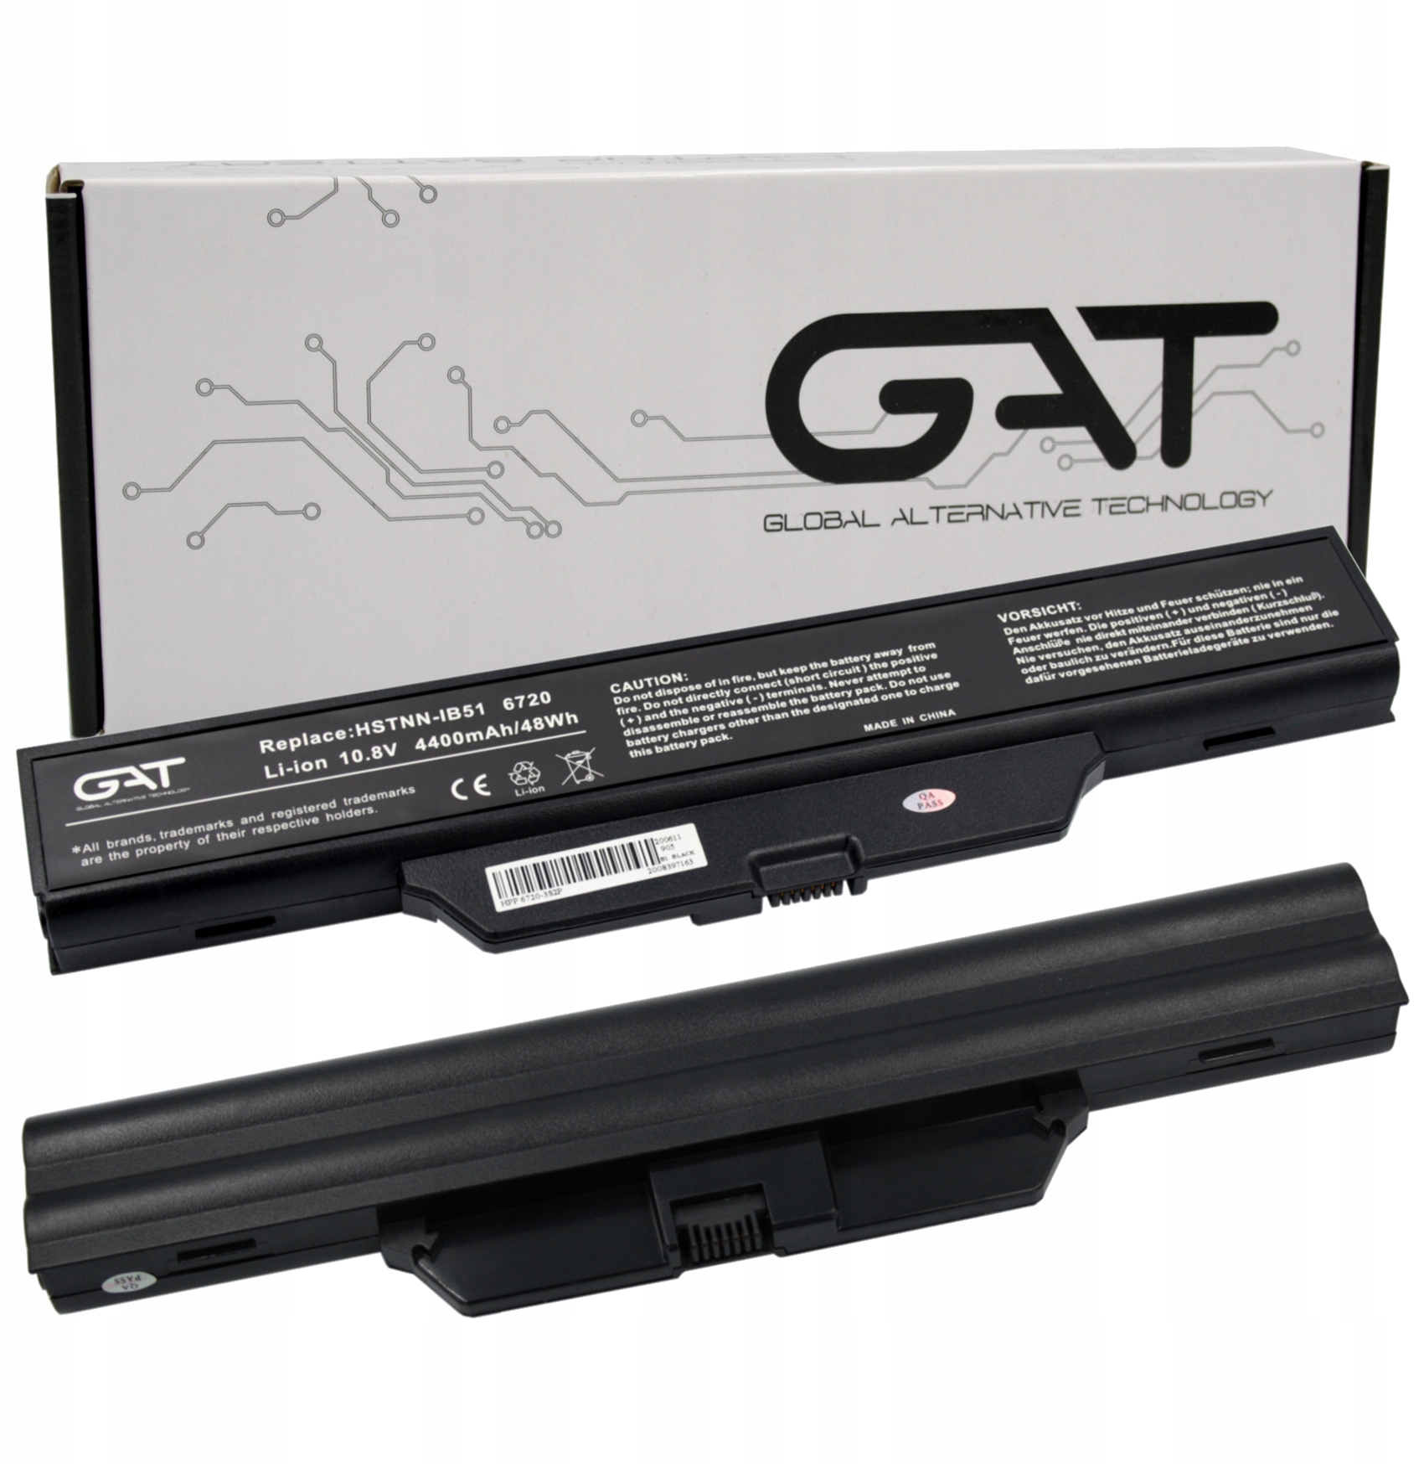 BATERIA AKUMULATOR HP 6720S 550 610 615 6735s 6820s - Baterie do laptopów